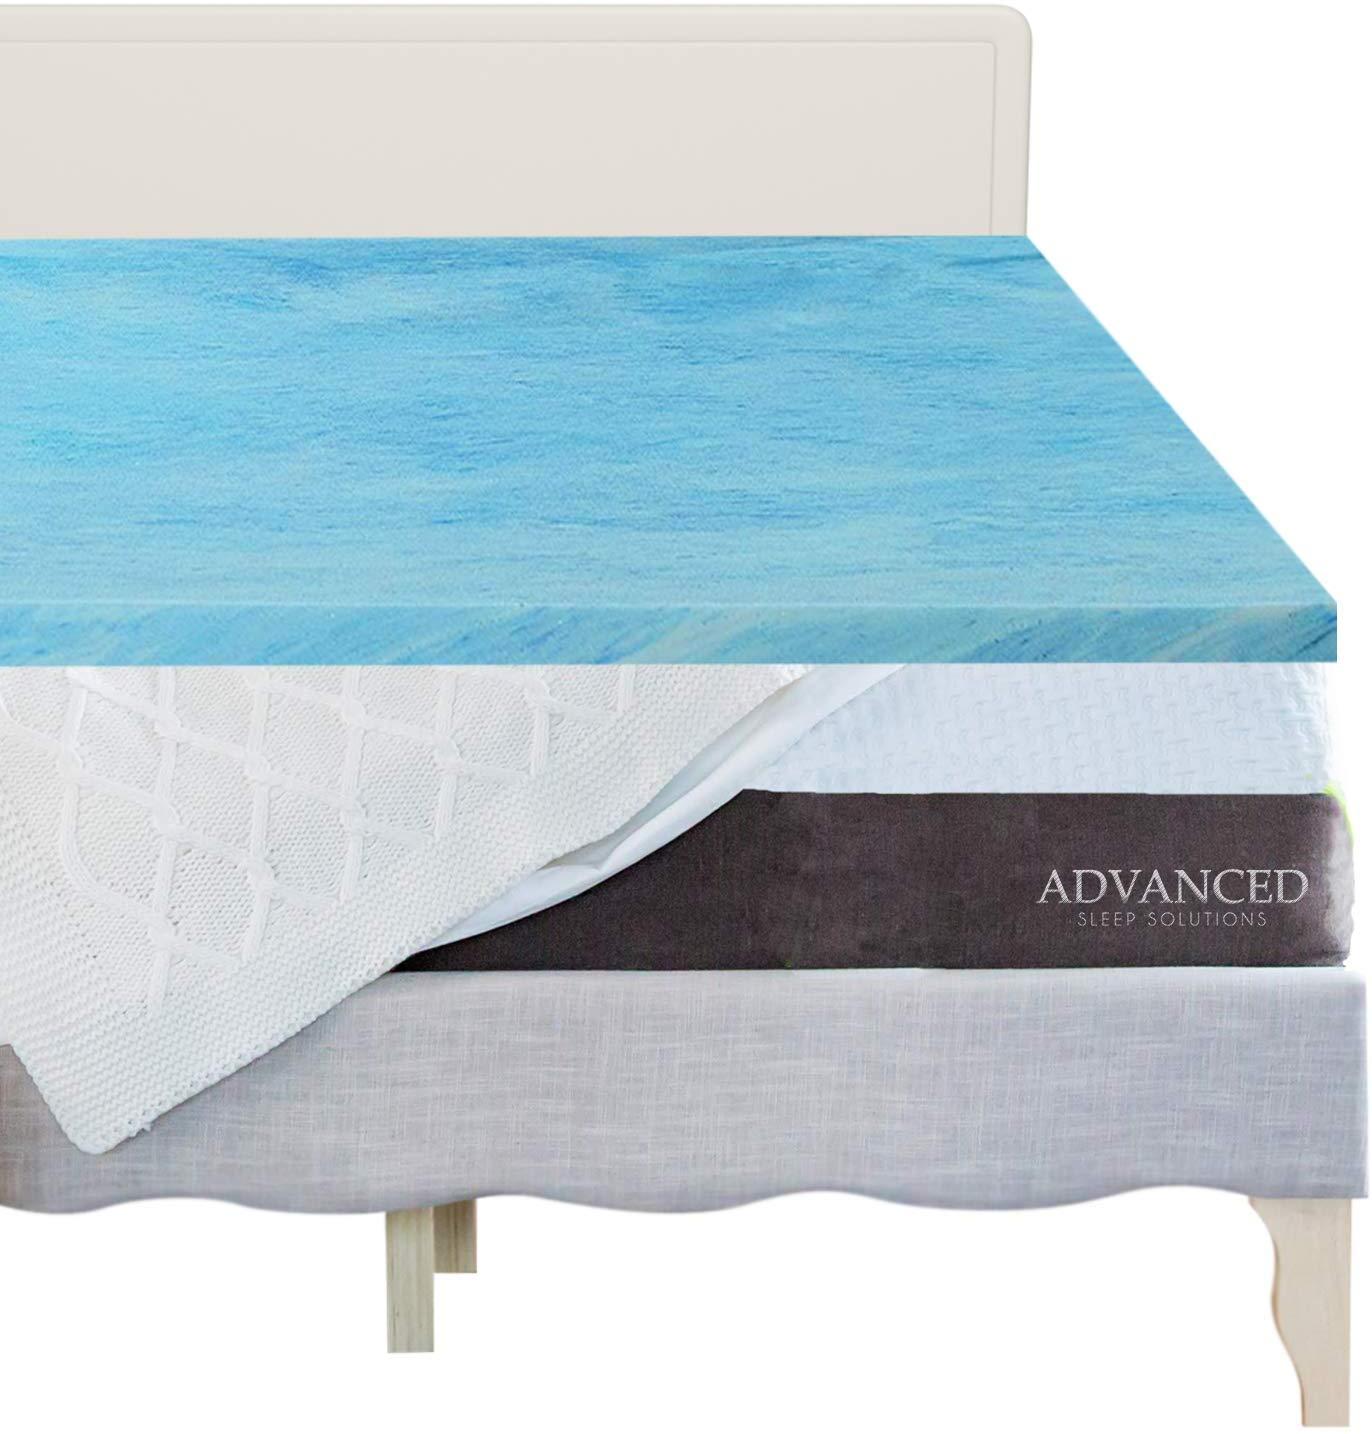 Advanced Sleep Solutions best firm mattress topper review by www.dailysleep.org